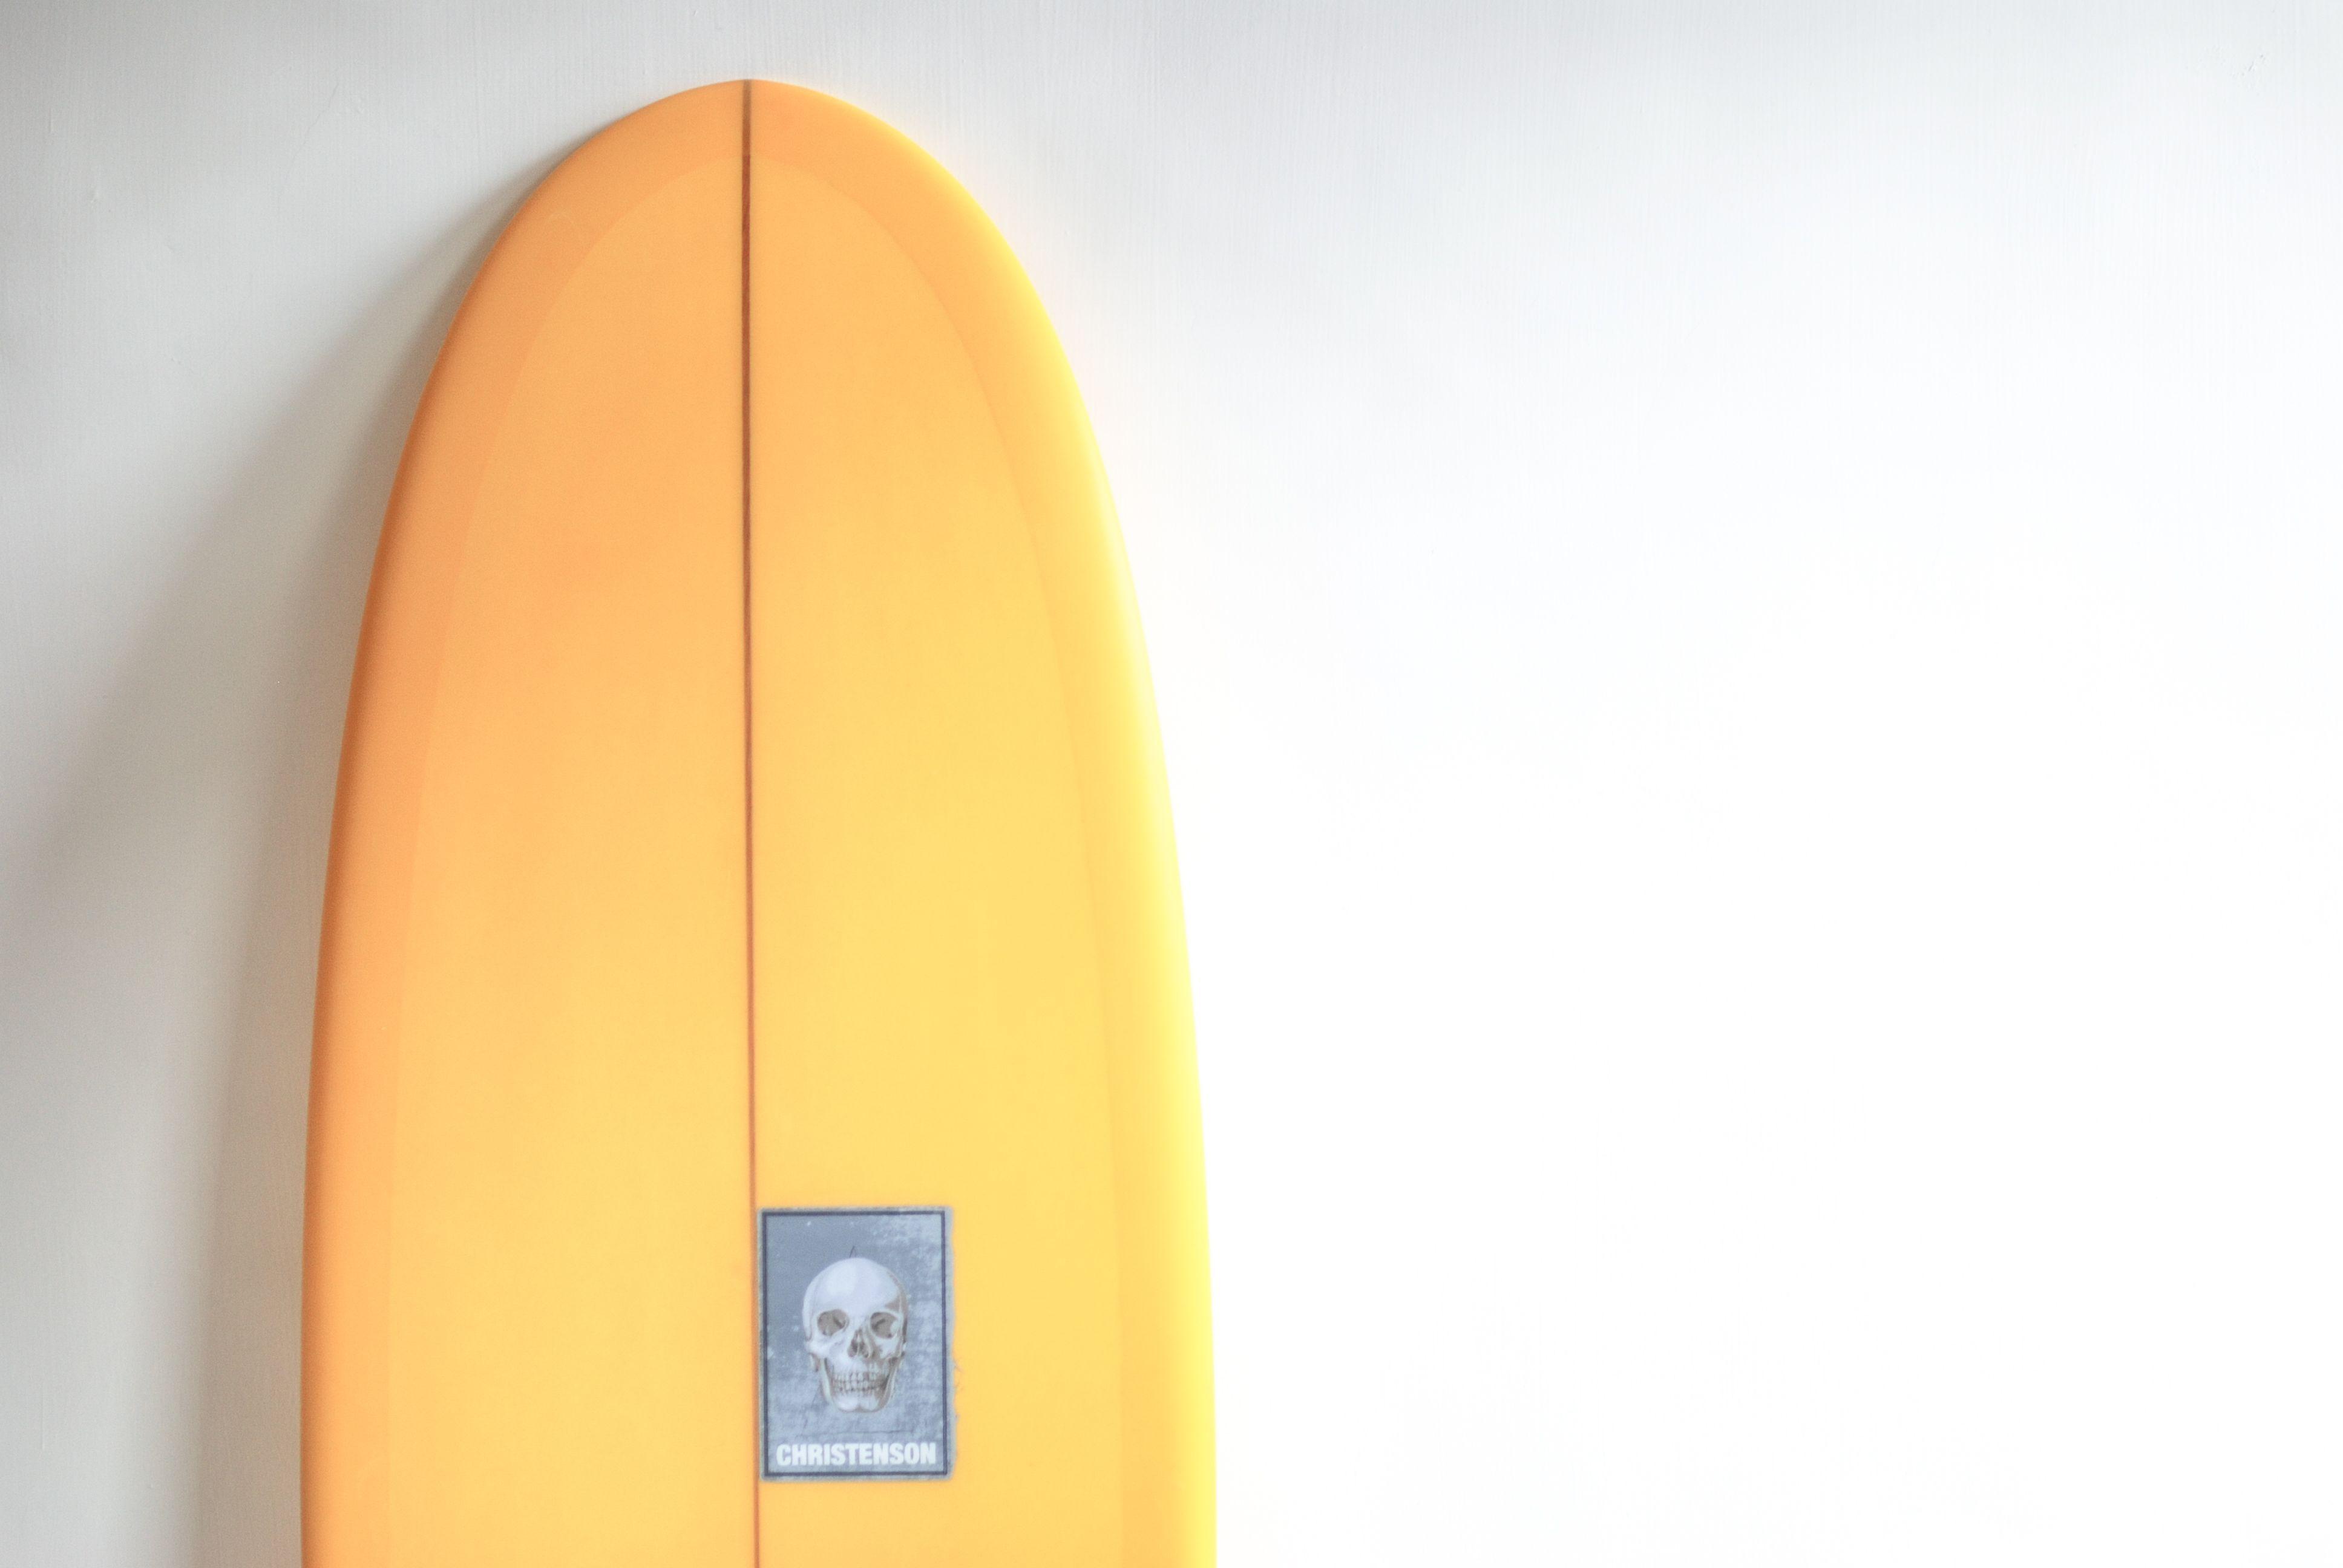 #upstairs #upstairs_shop #surf #gosurf #surfboard #short board #beach #beachhouse #chrischristenson #christenson #photography #fin #flowers